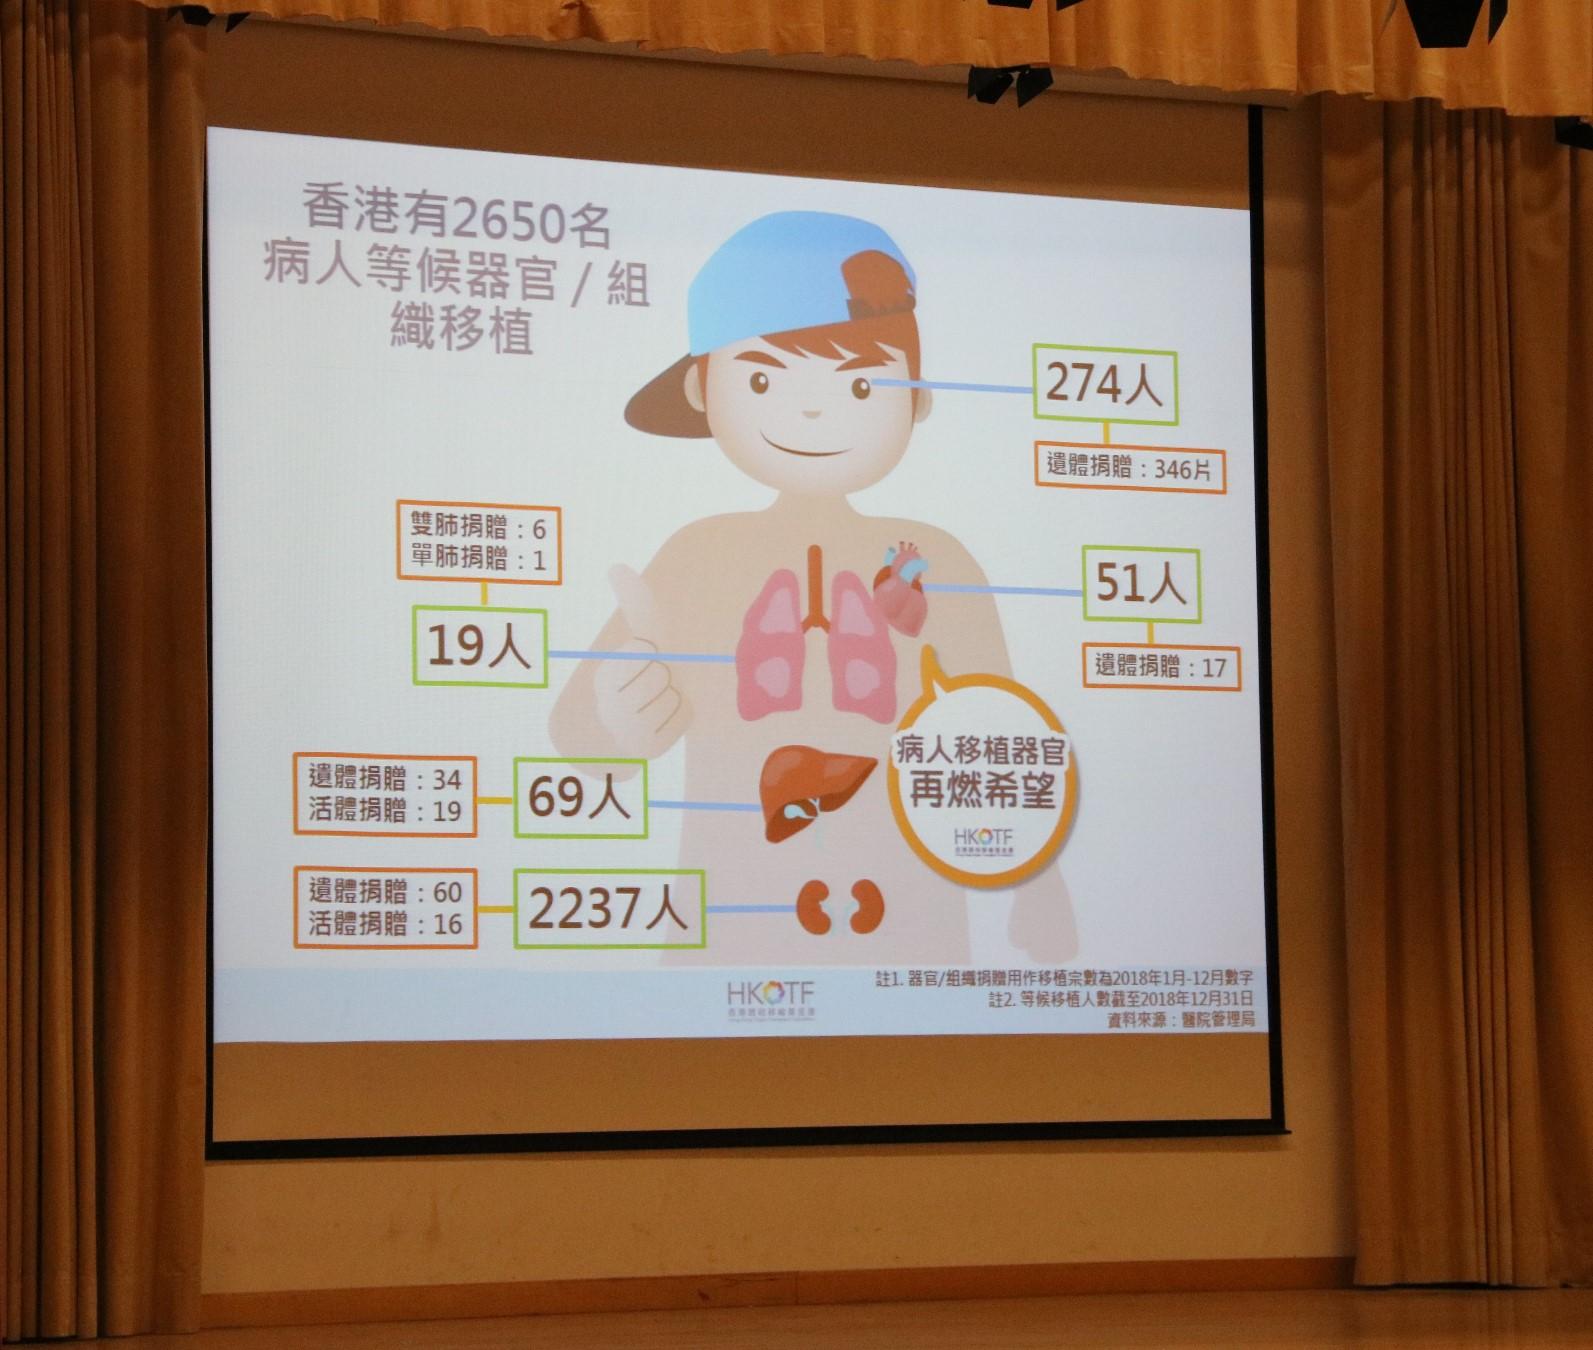 https://www.npc.edu.hk/sites/default/files/img_6915.jpg